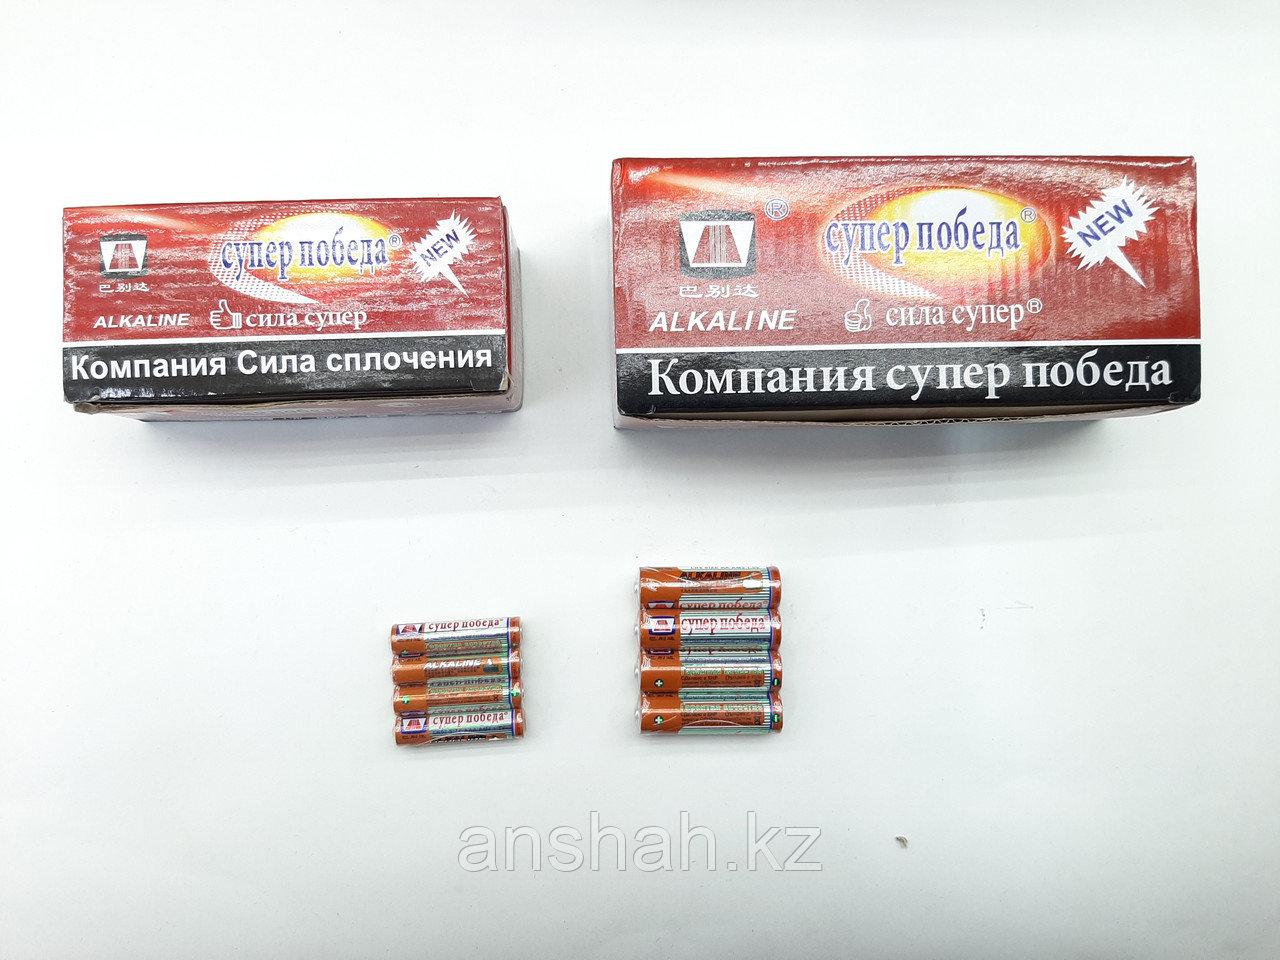 Батарейки Супер Победа мизинчиковые АА(20уп*60шт60 штук в пачке)